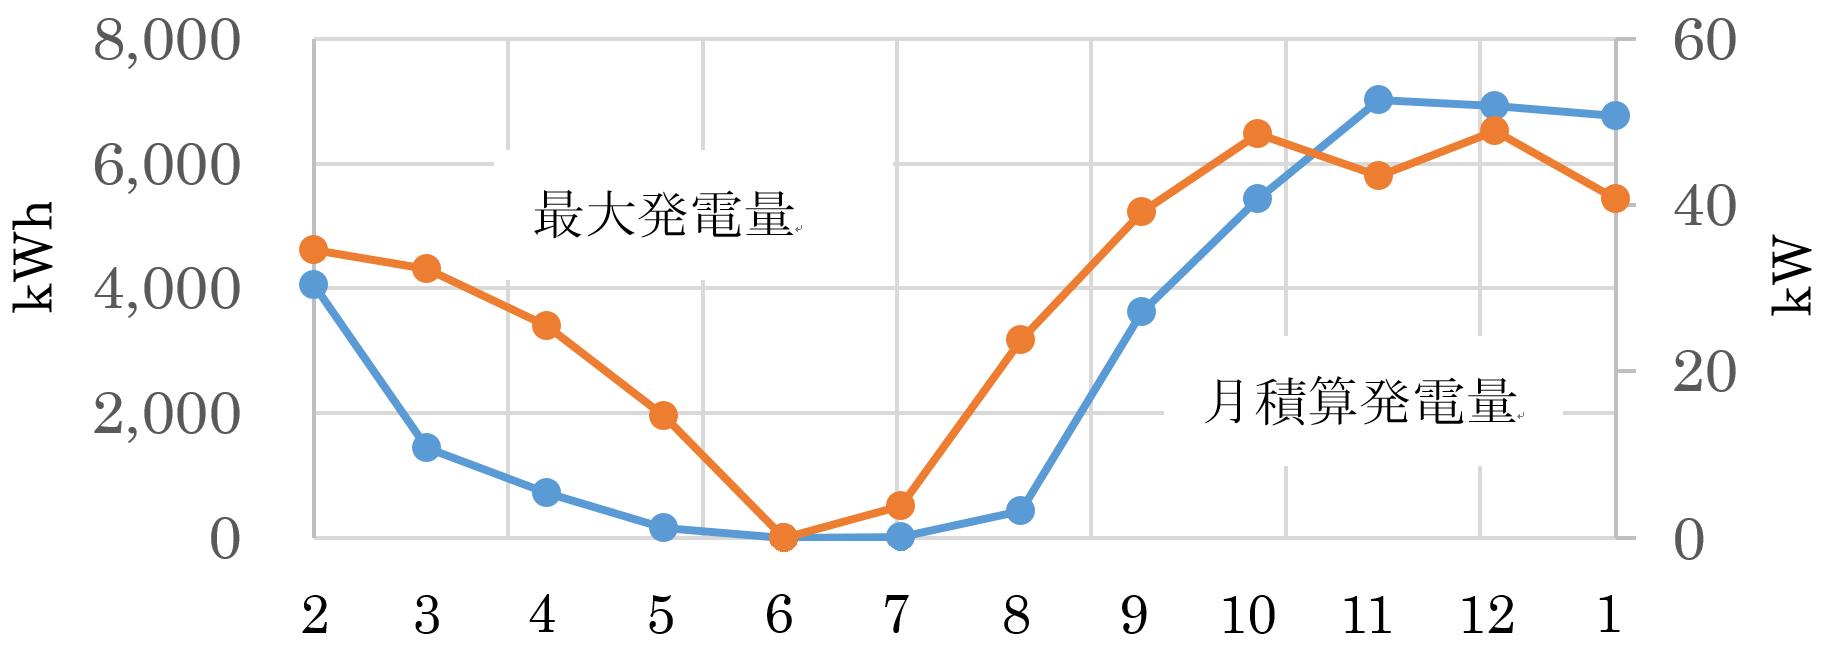 ishizawa_7